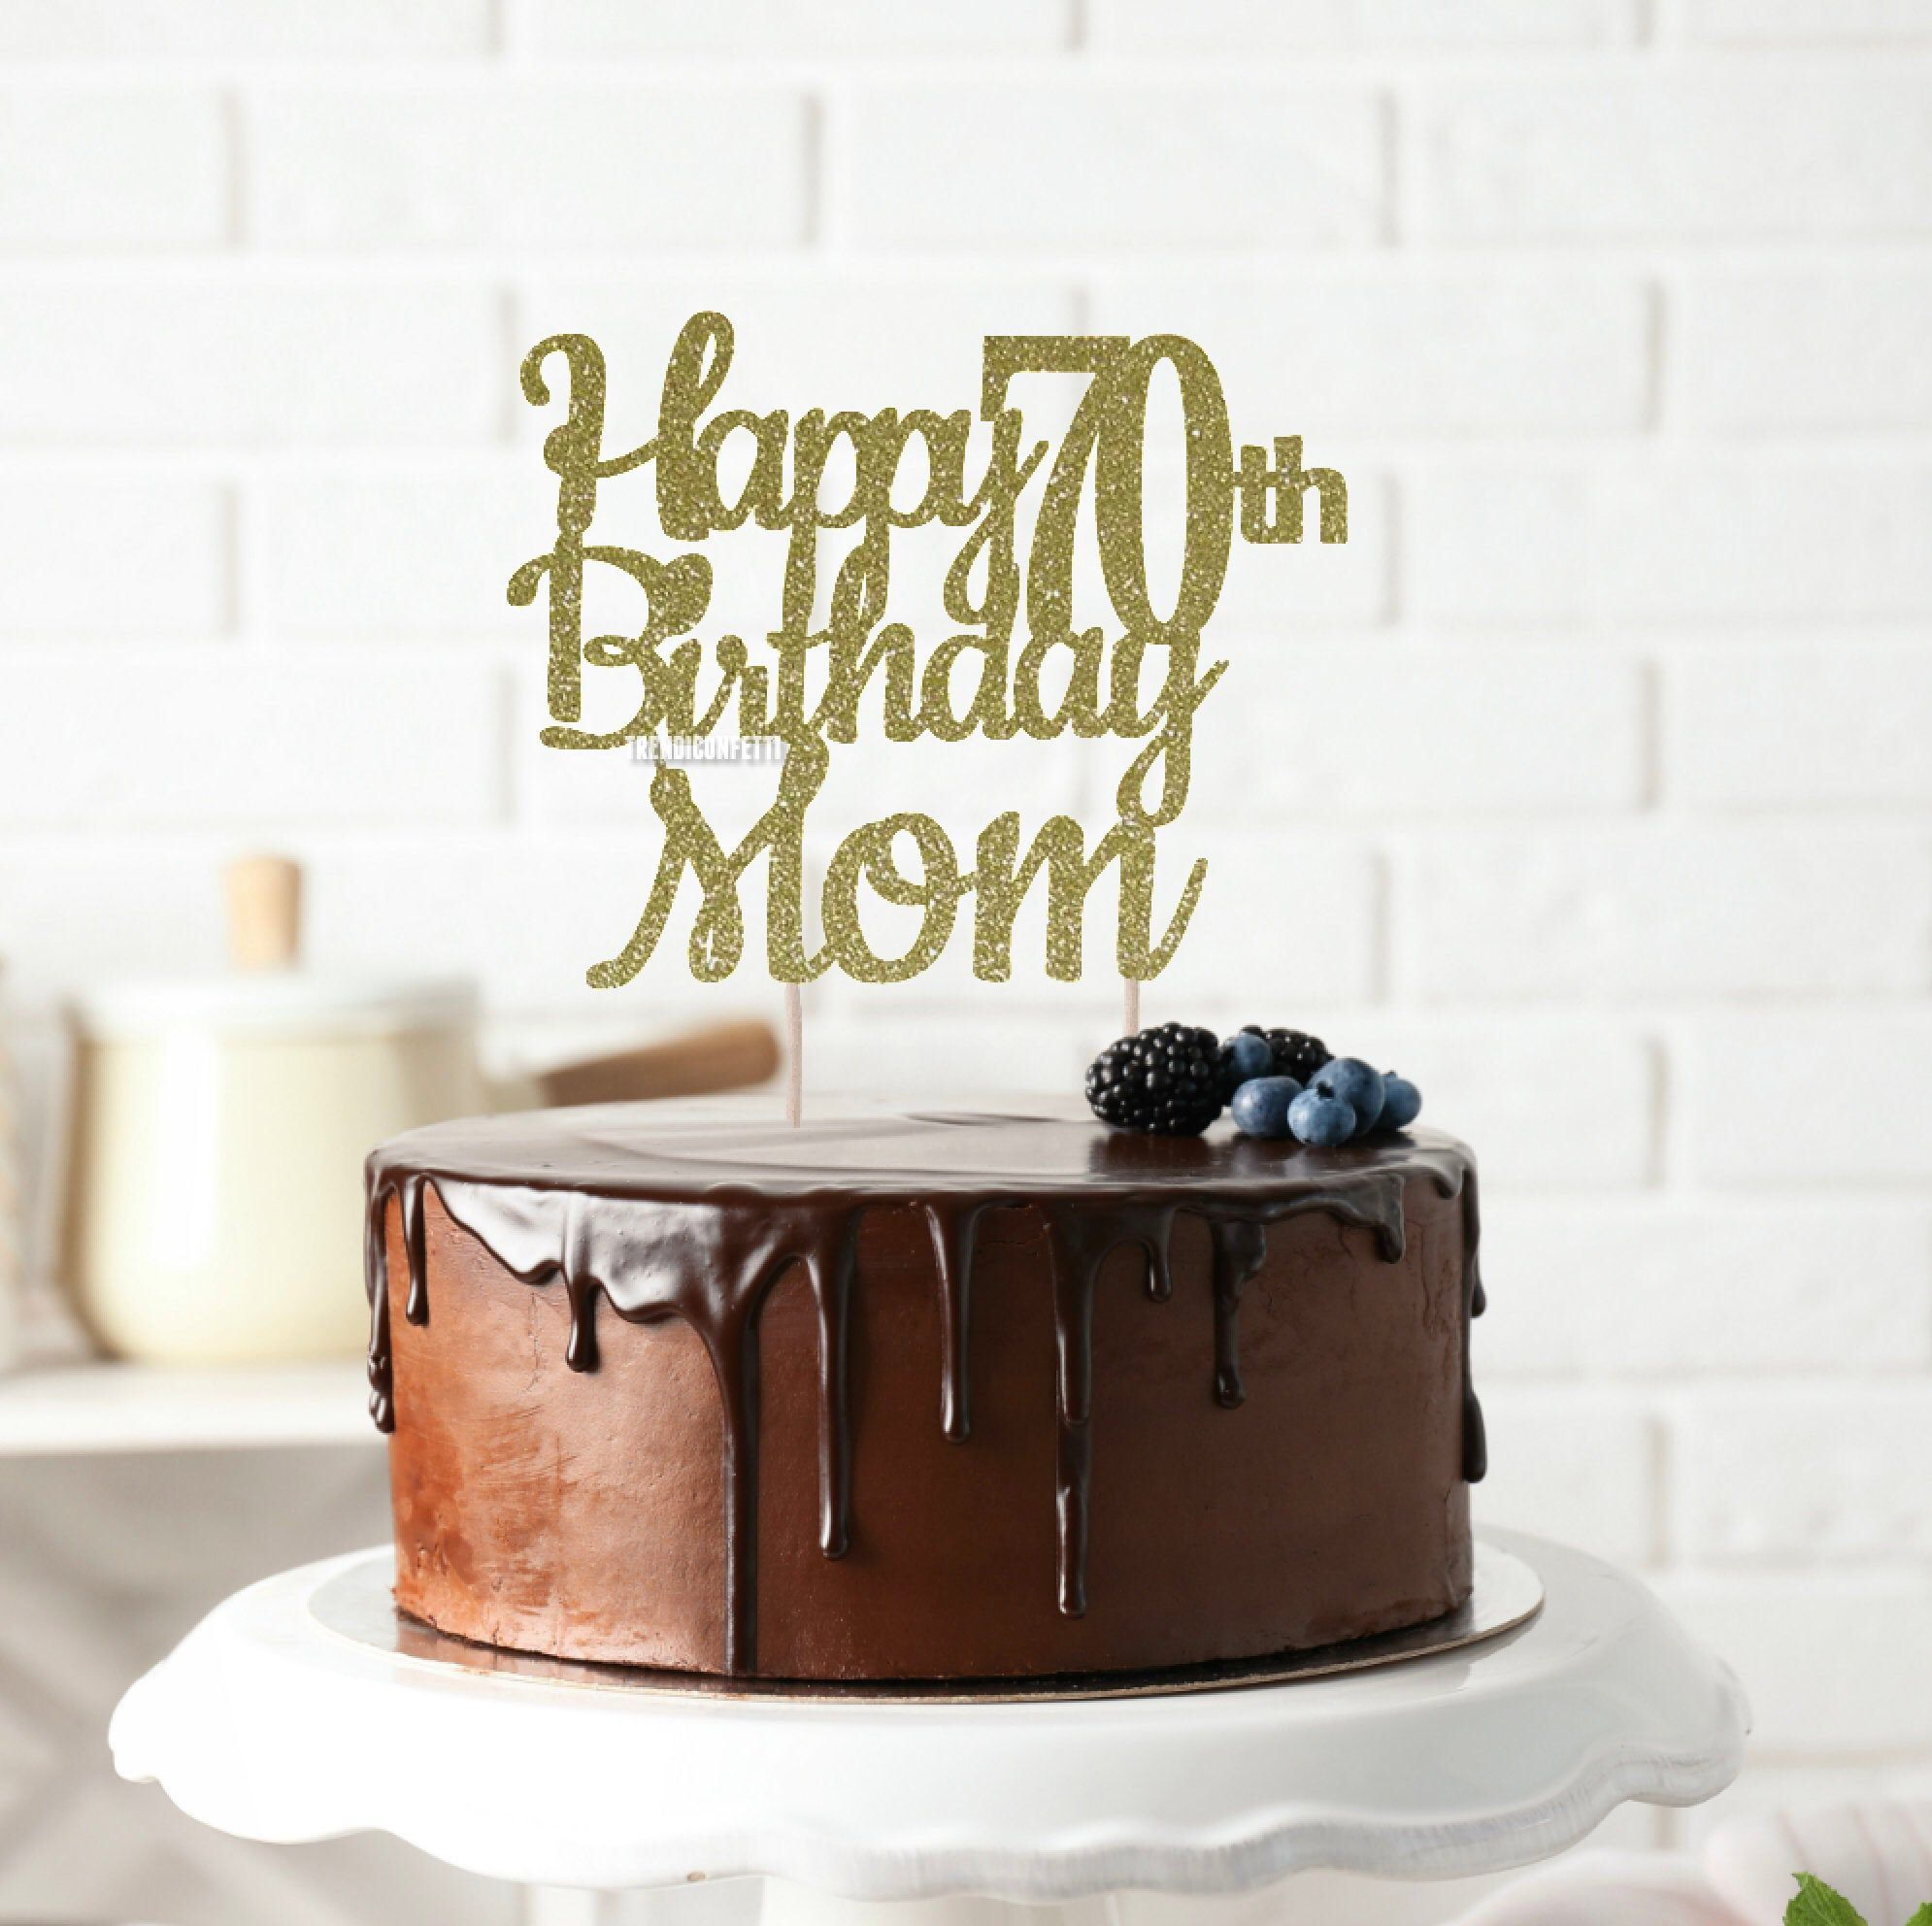 Amazon Com Alpha K Gg 70th Birthday Cake Topper Happy 70th Birthday Cake Topper 70th Birthday Party Decorations Toys Games